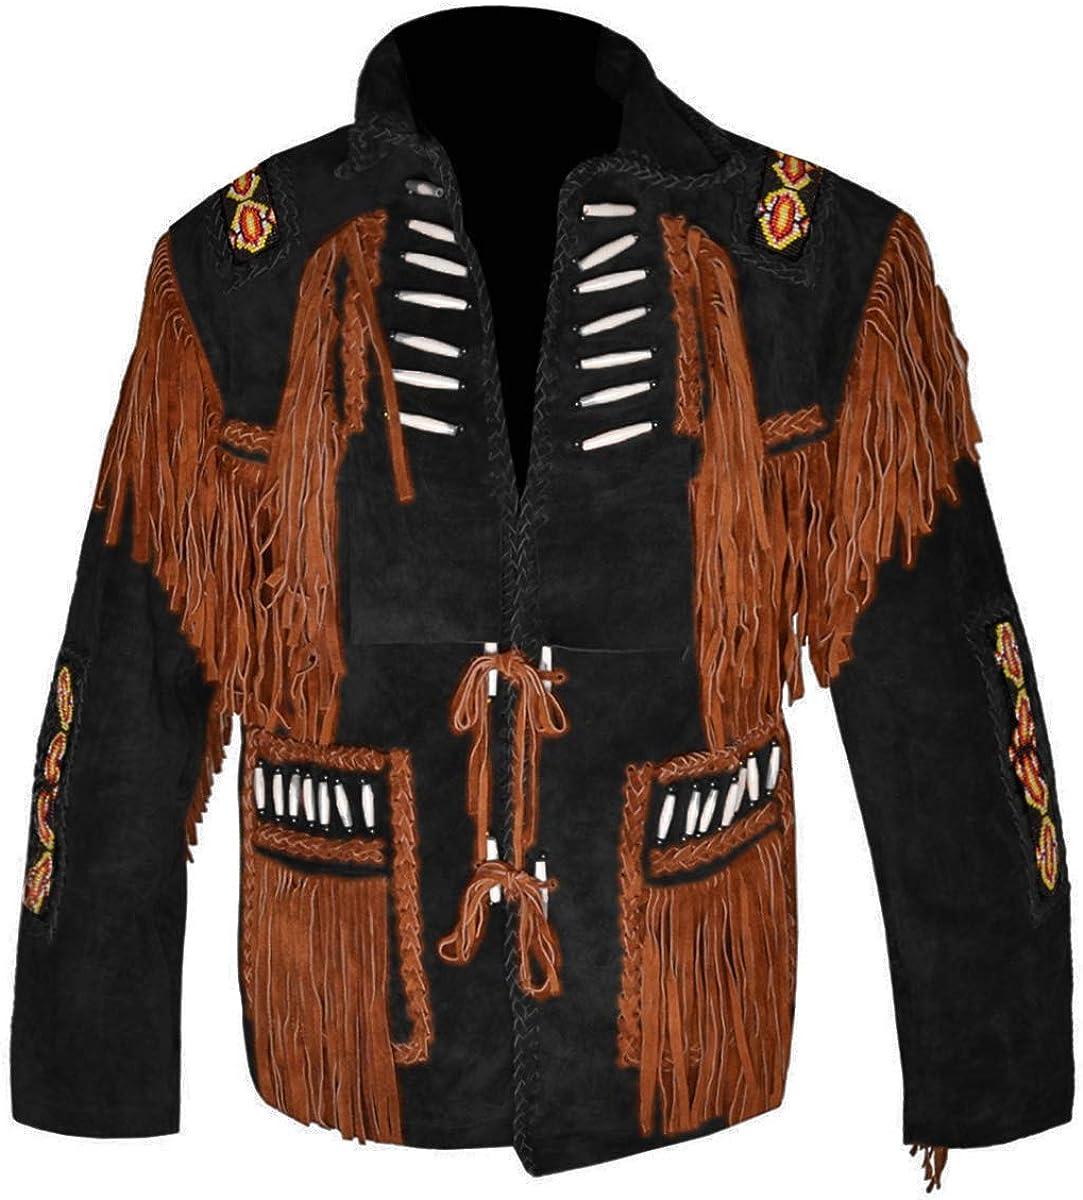 MSHC Western Cowboy Mens Bone /& Fringed Suede Leather Jacket D4 XXS-5XL Brown RED Blue Black